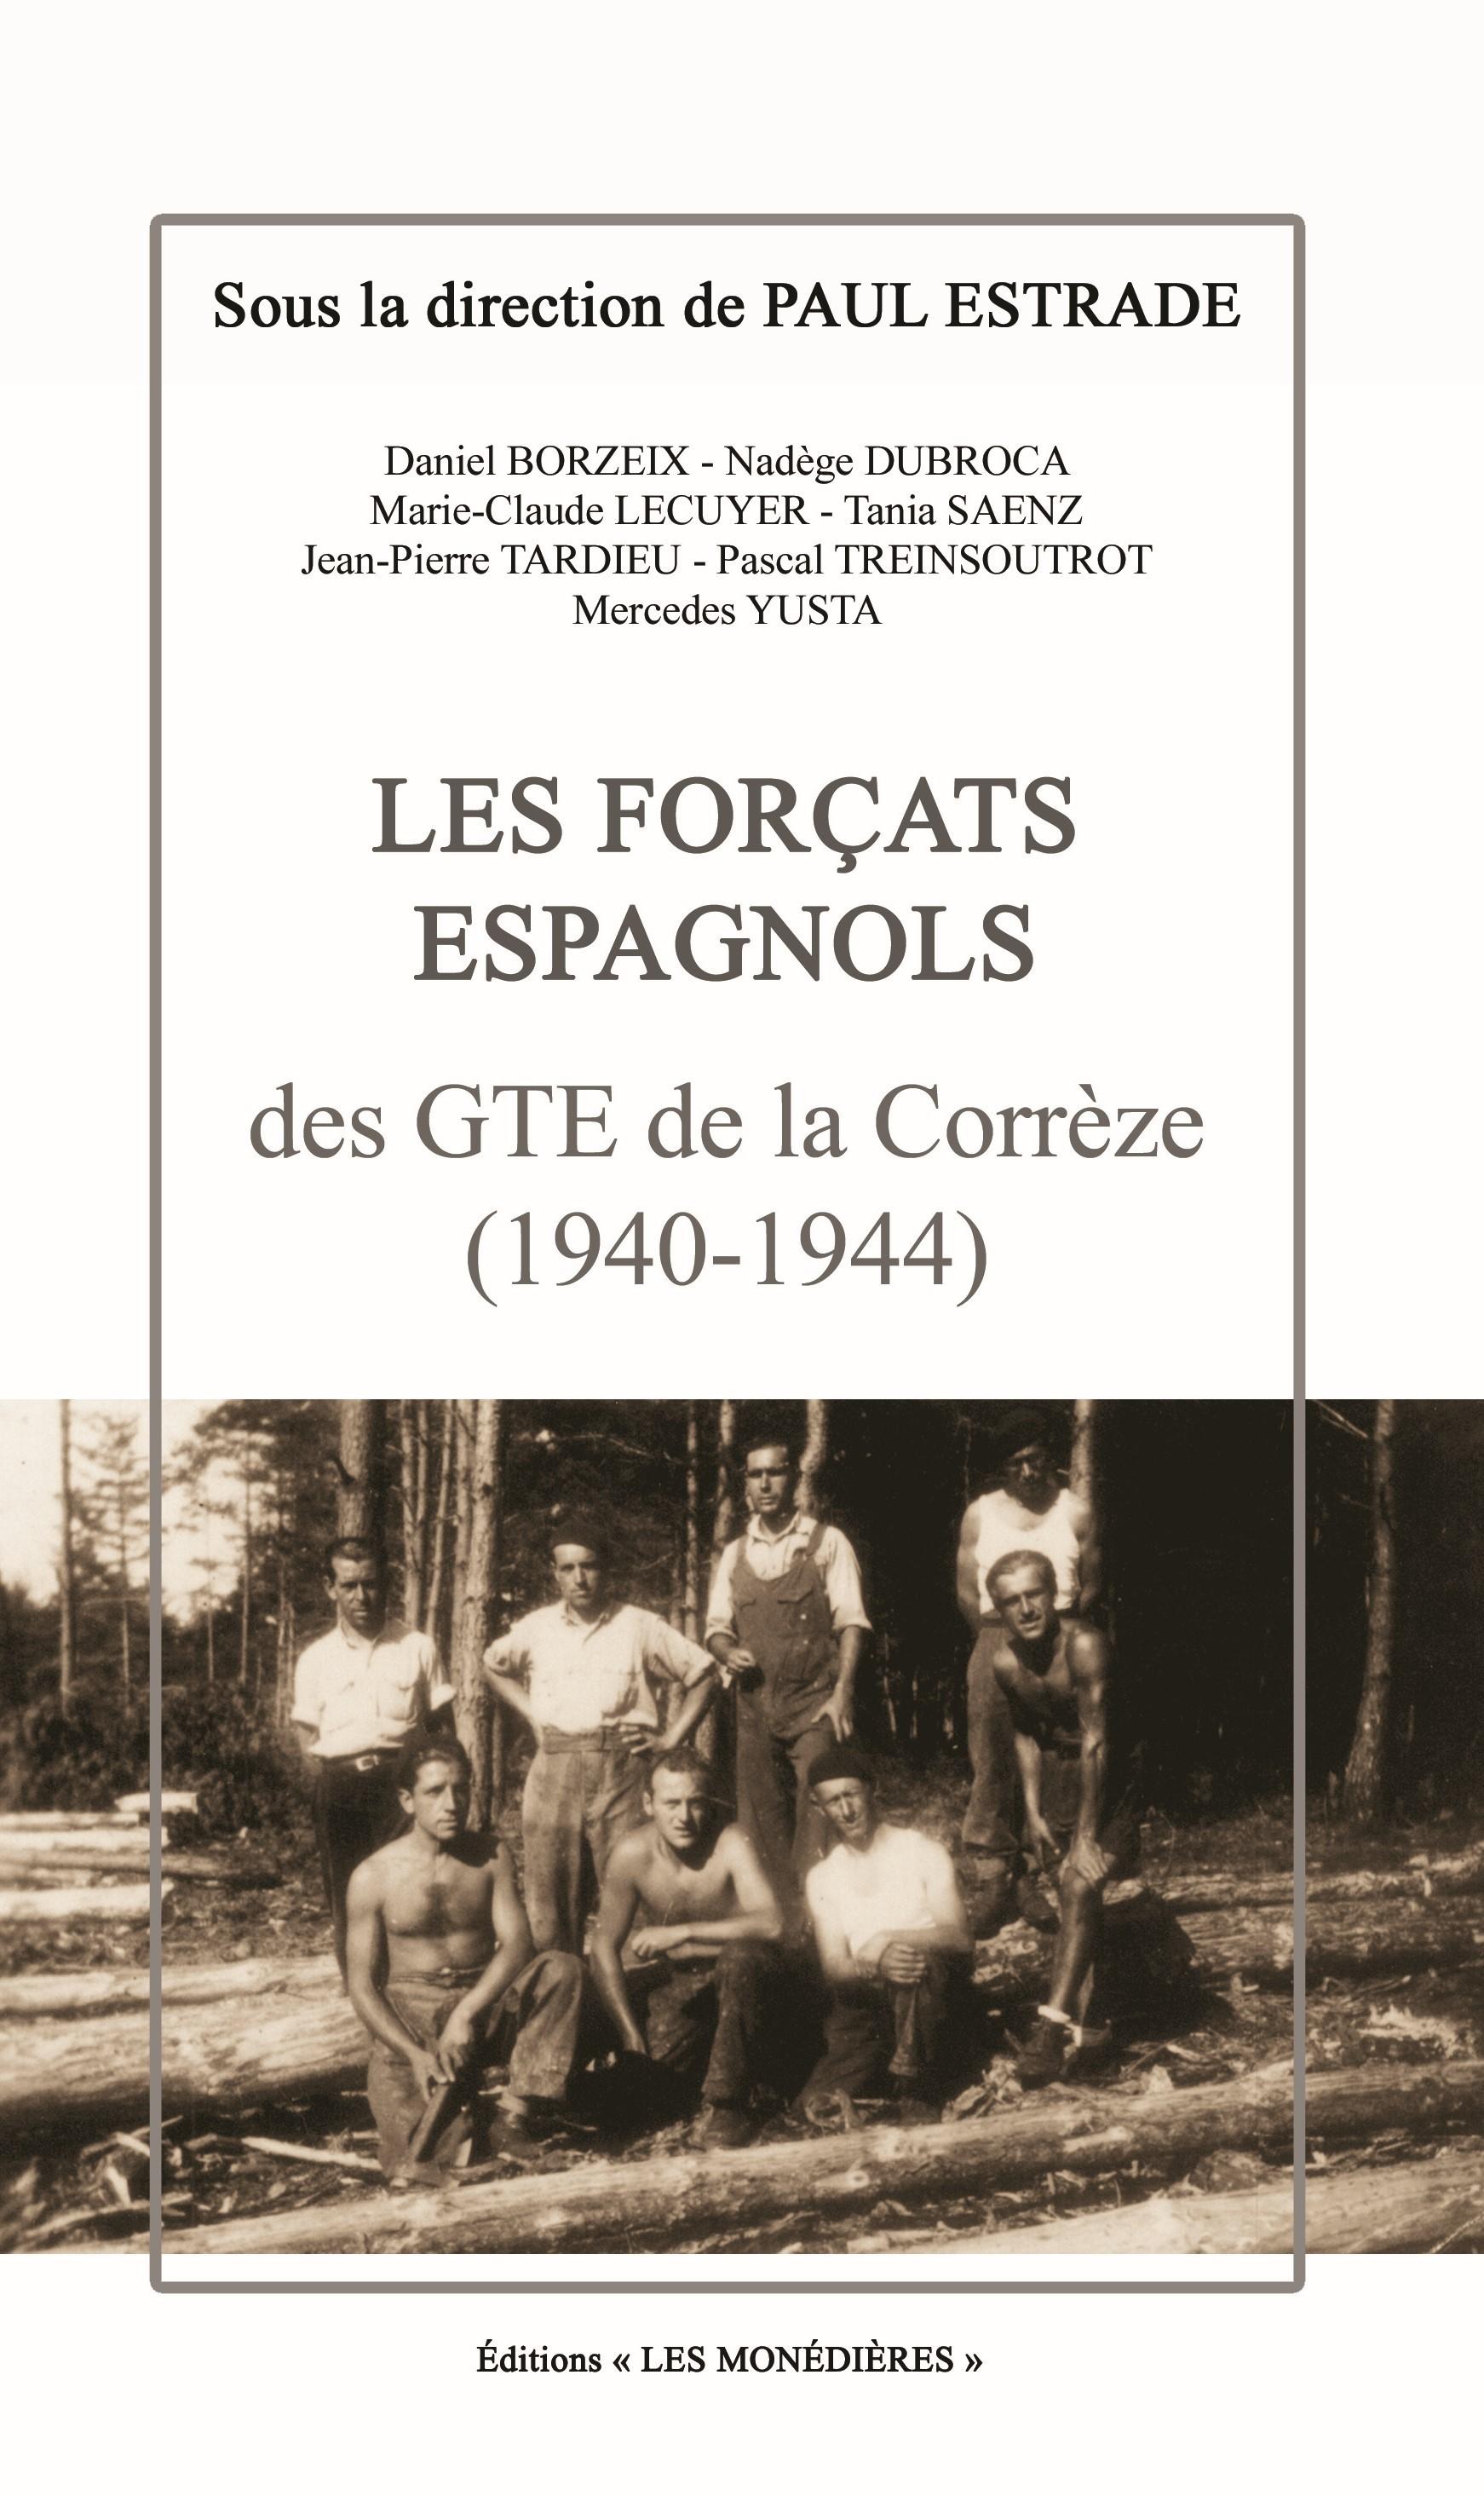 LES FORCATS ESPAGNOLS DES GTE DE LA CORREZE (1940-1944)